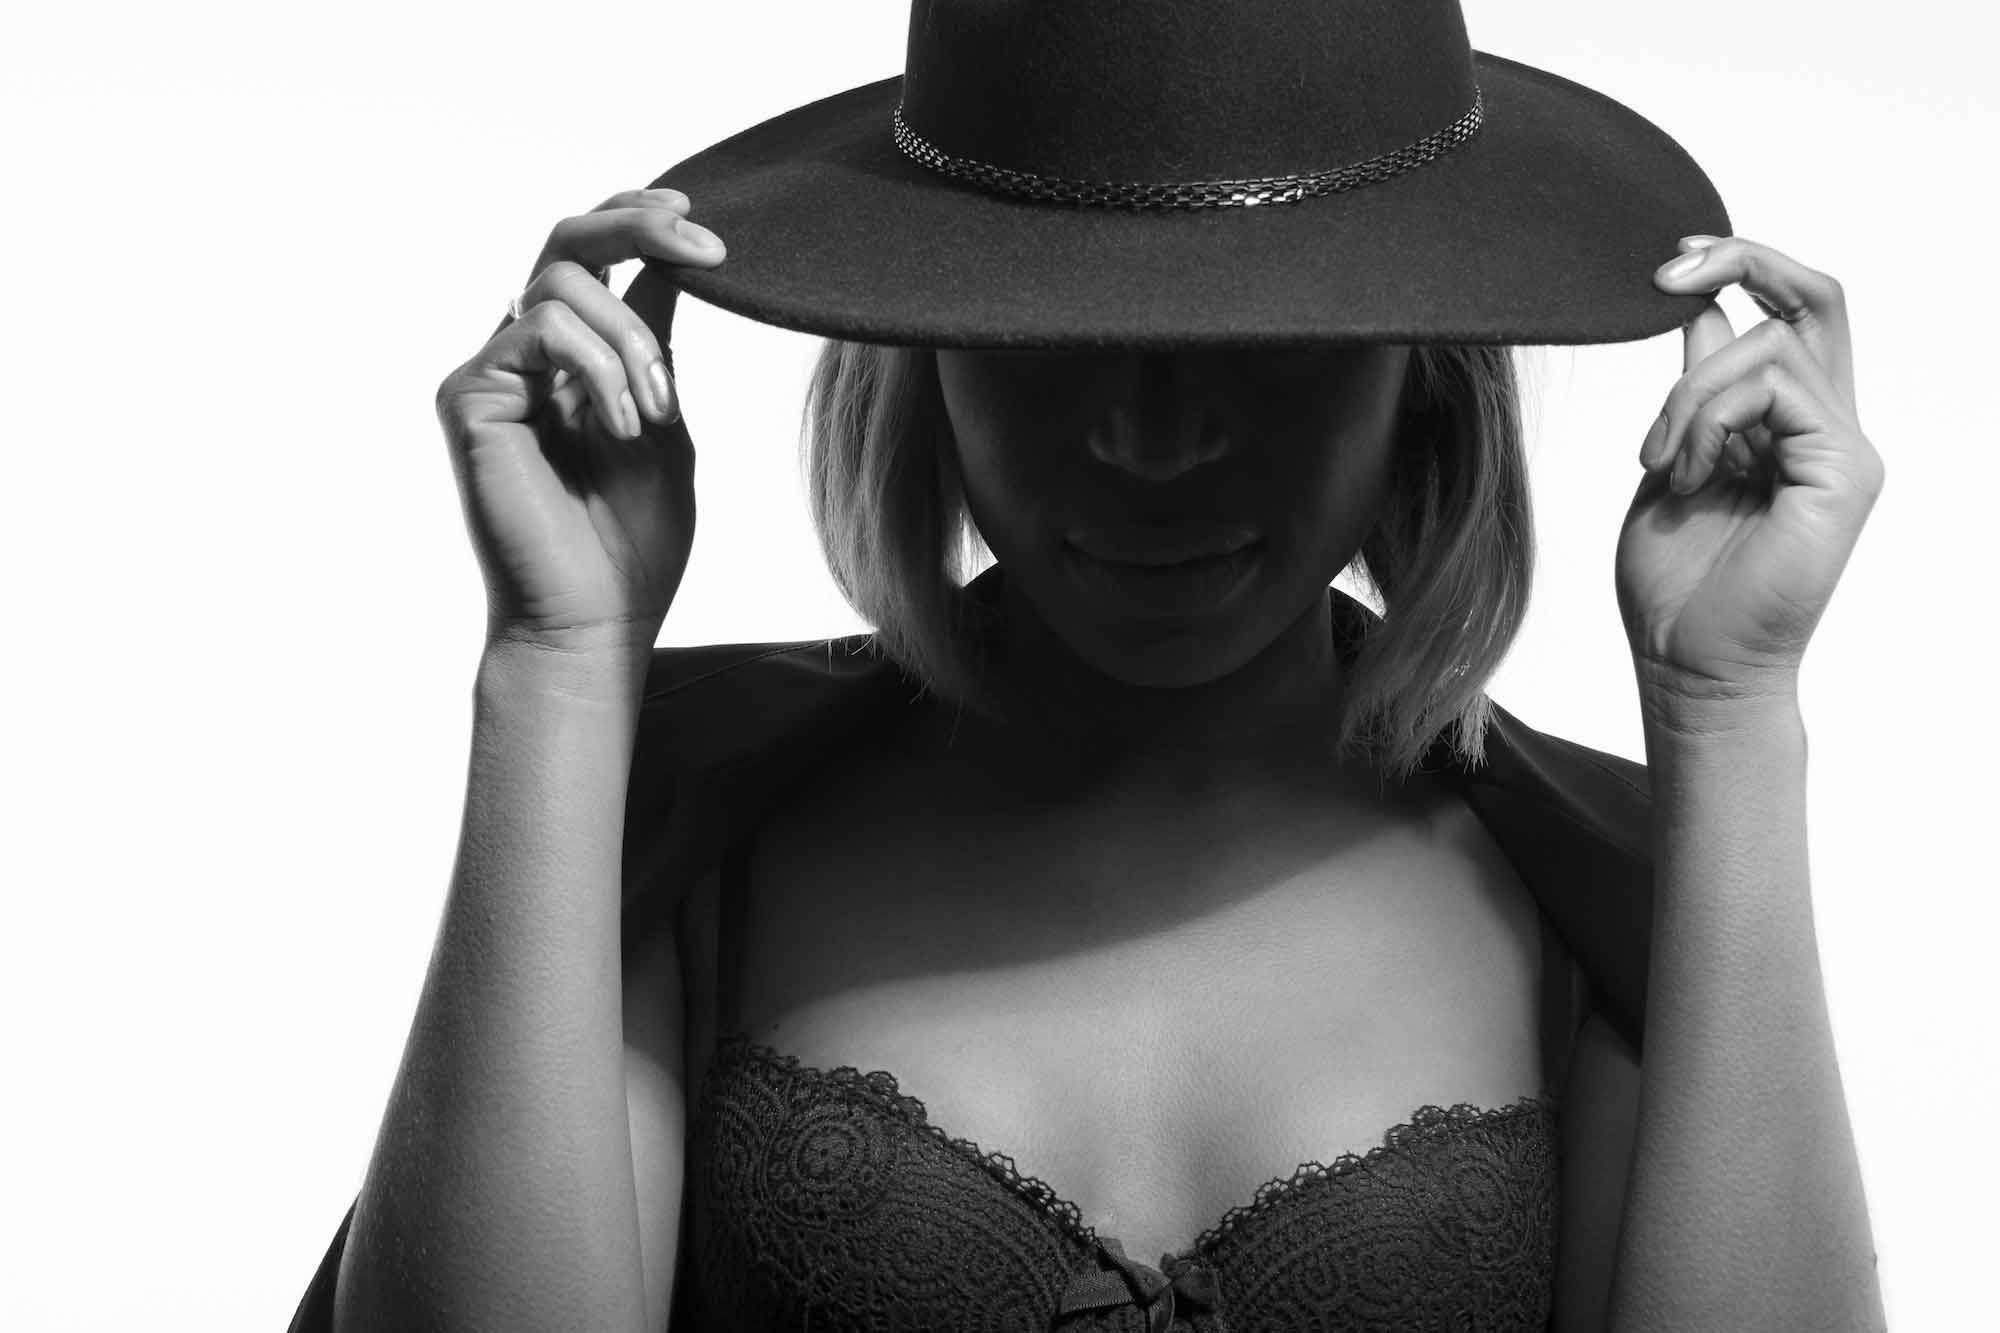 Fashion Photography Beauty Portrait Photographer Jose Jeuland 7